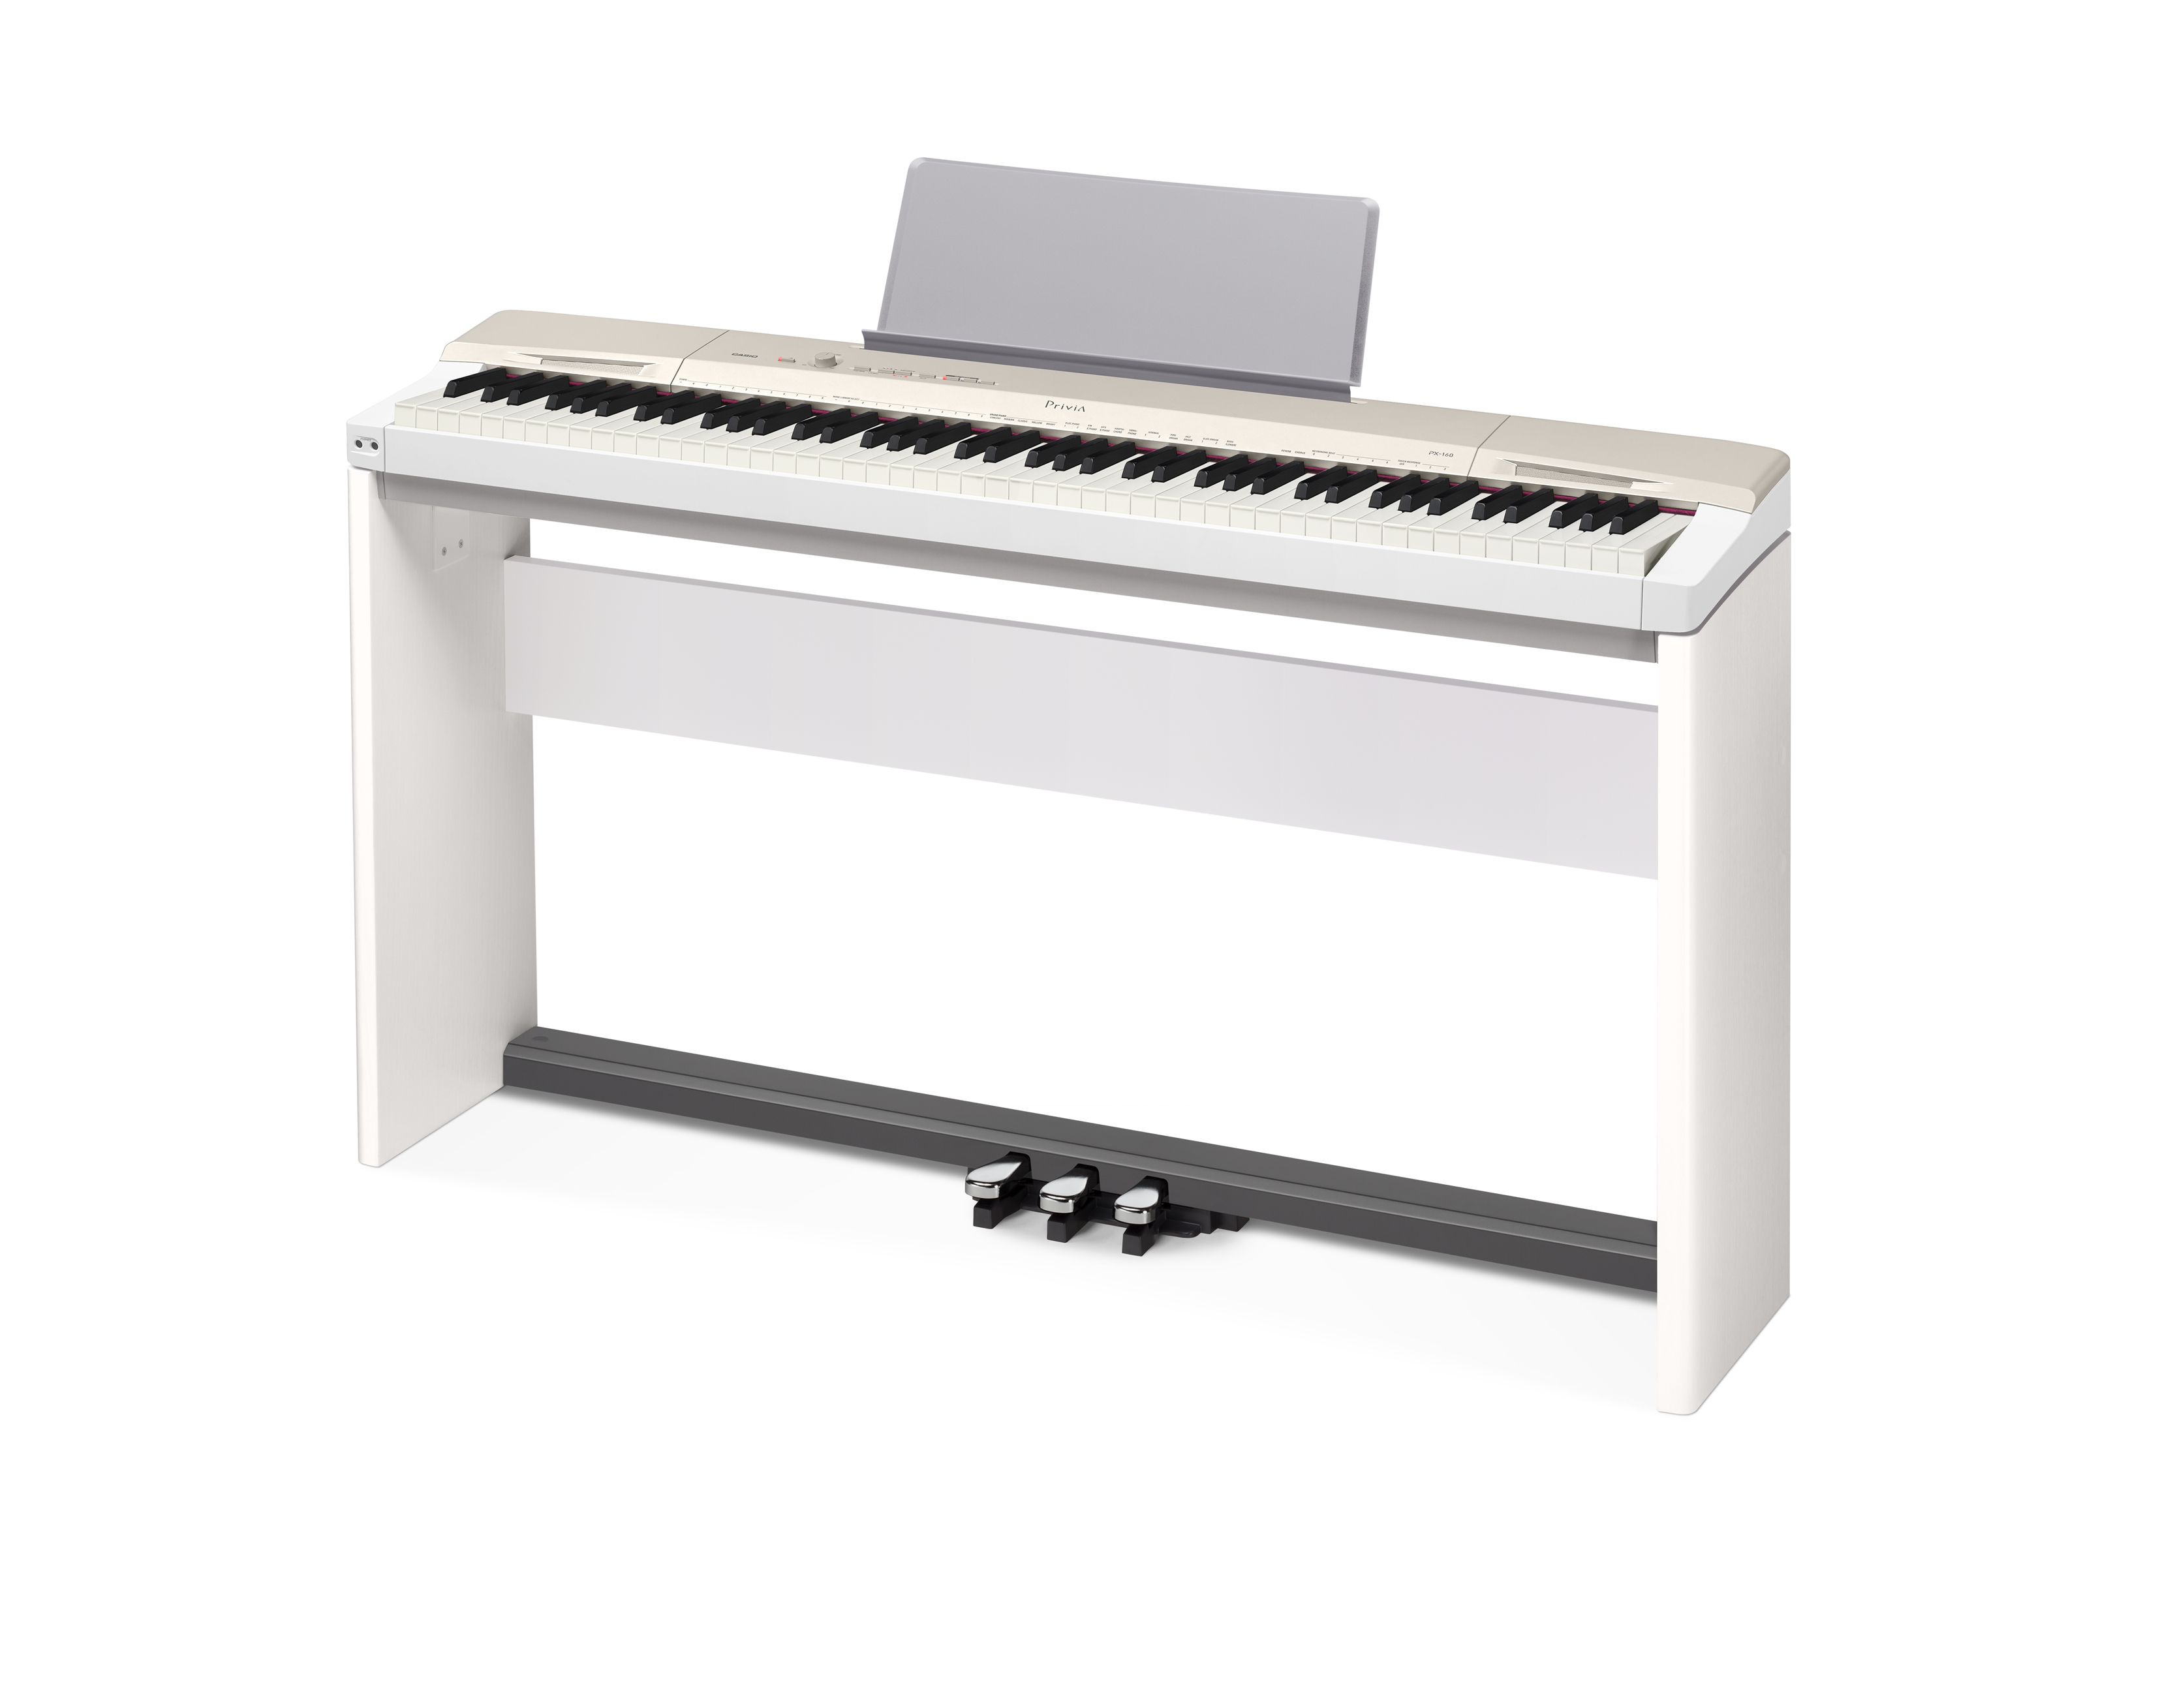 Piano Digital Casio Privia Px 160 : casio privia px 160 digital piano champagne gold w cs 67 stand sp 33 pedal ebay ~ Hamham.info Haus und Dekorationen